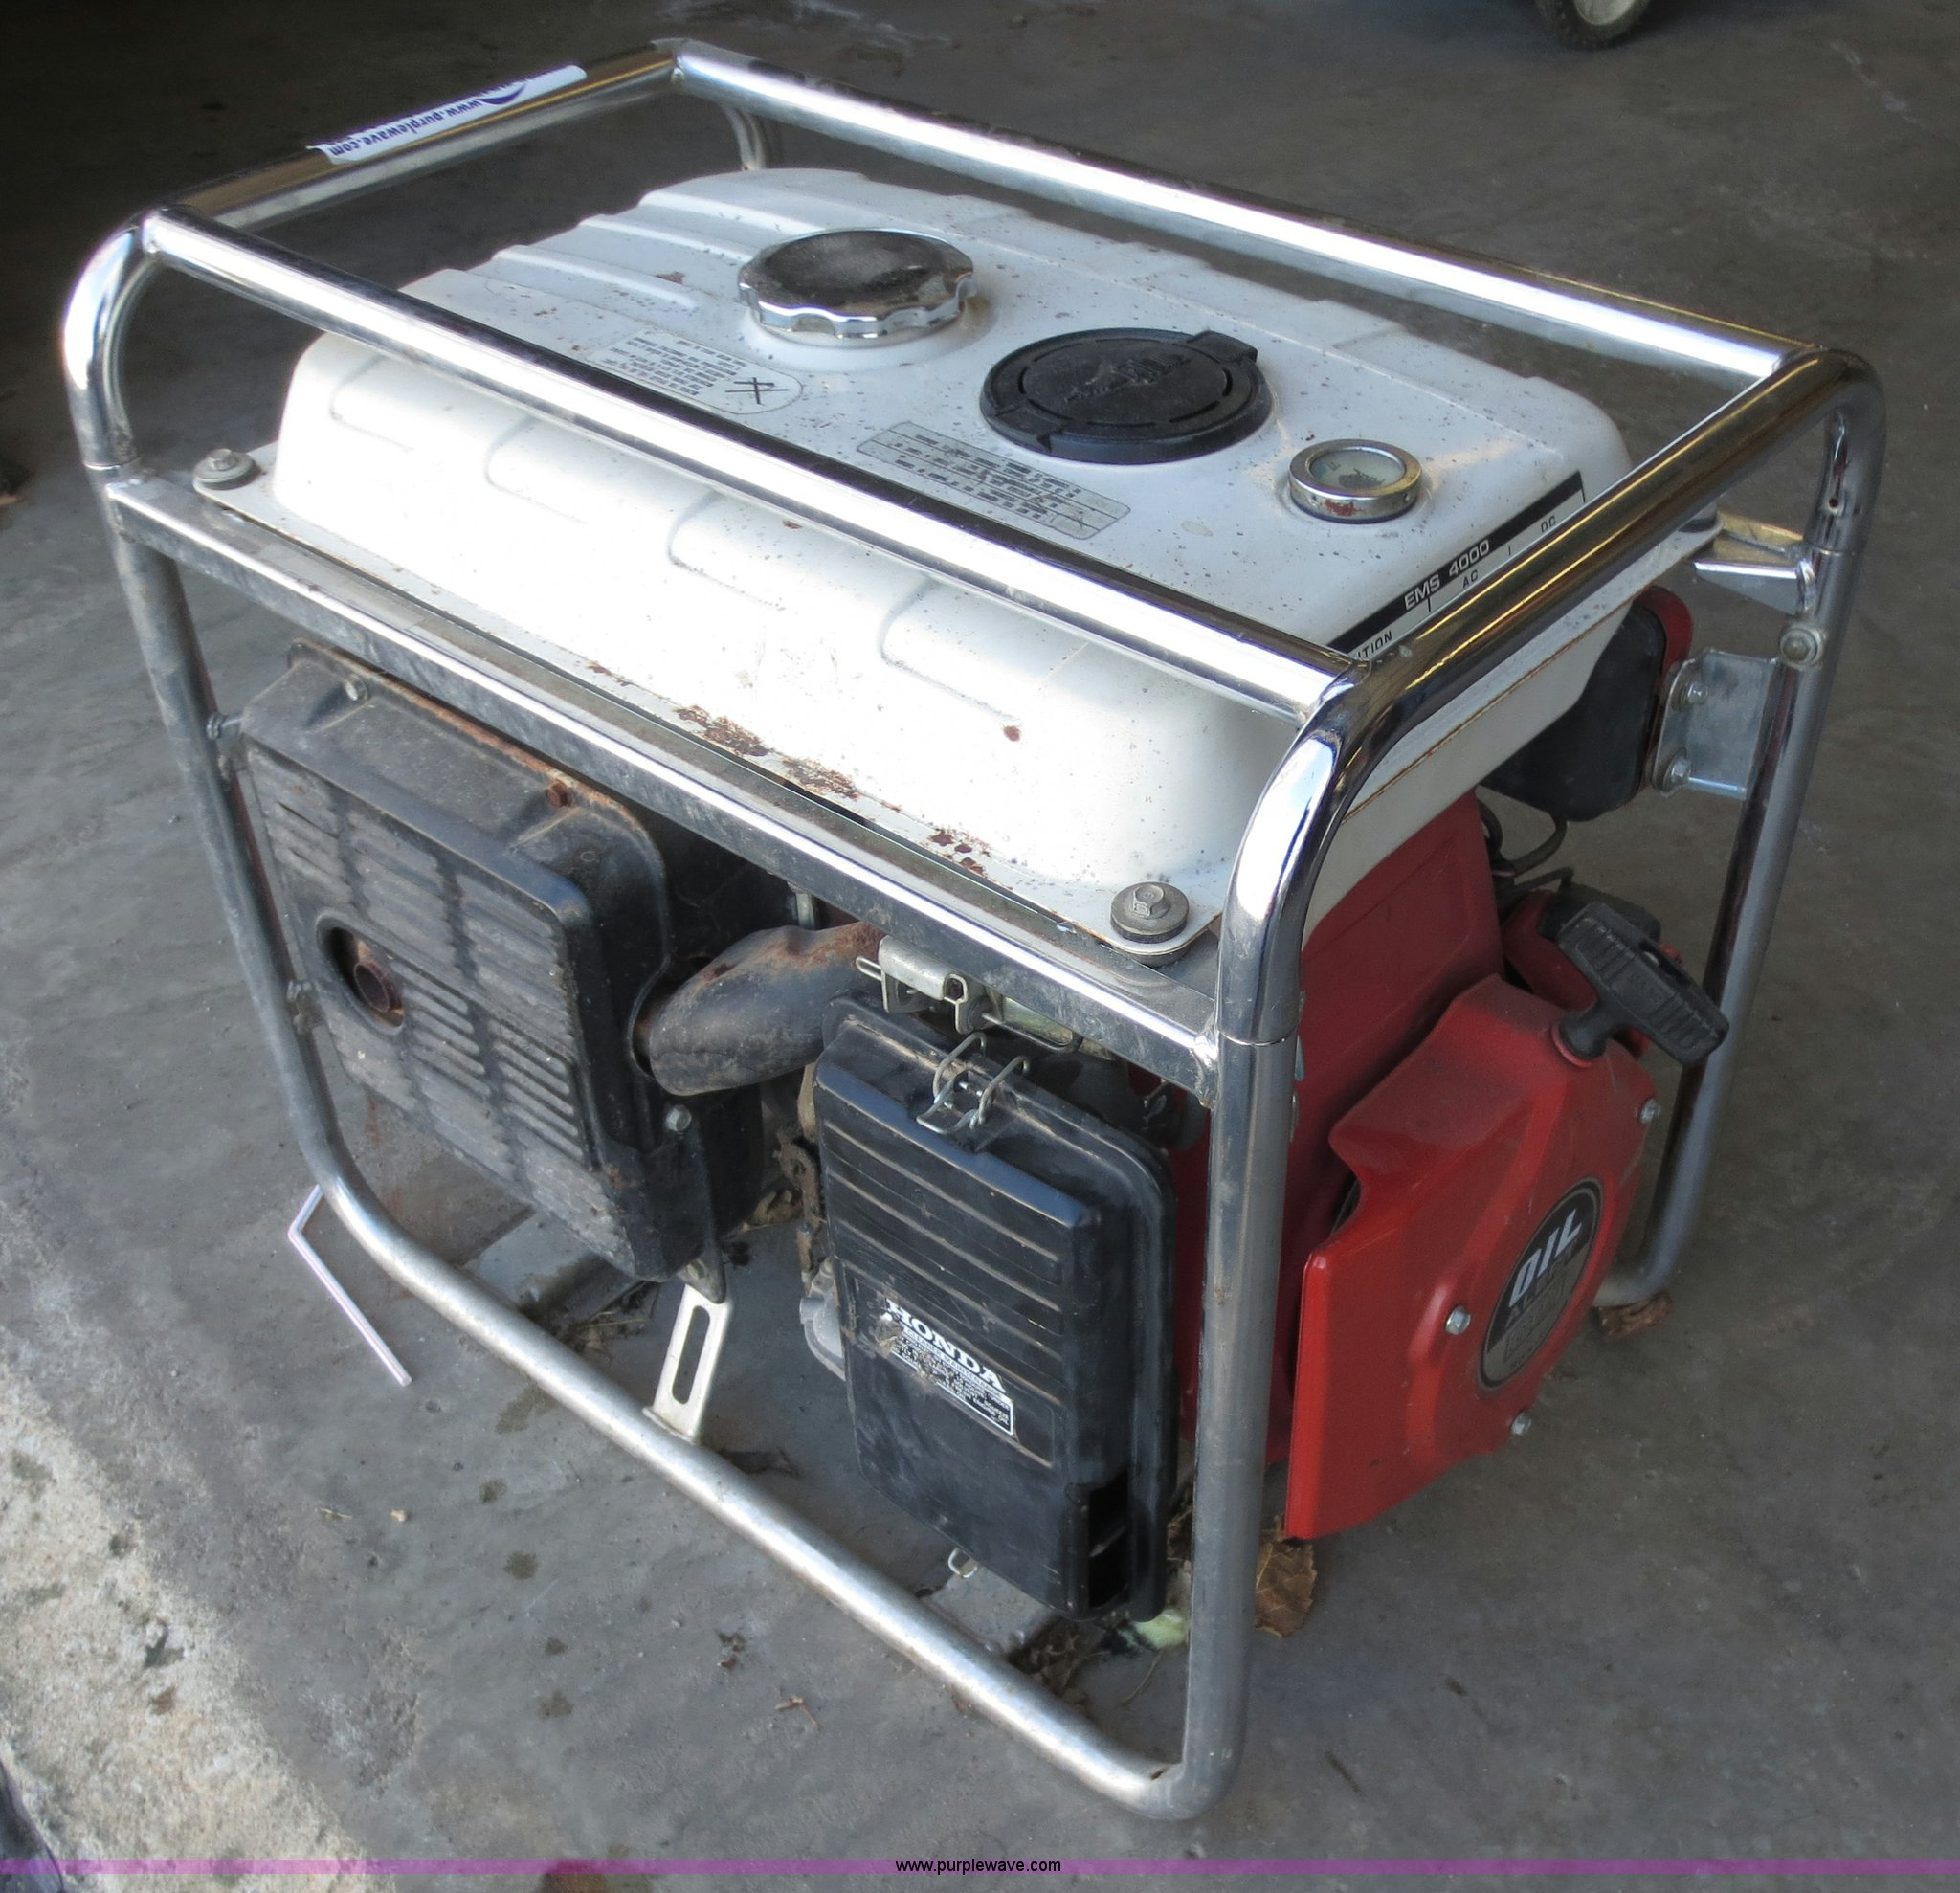 ... Honda 4,000 Watt Generator Full Size In New Window ...